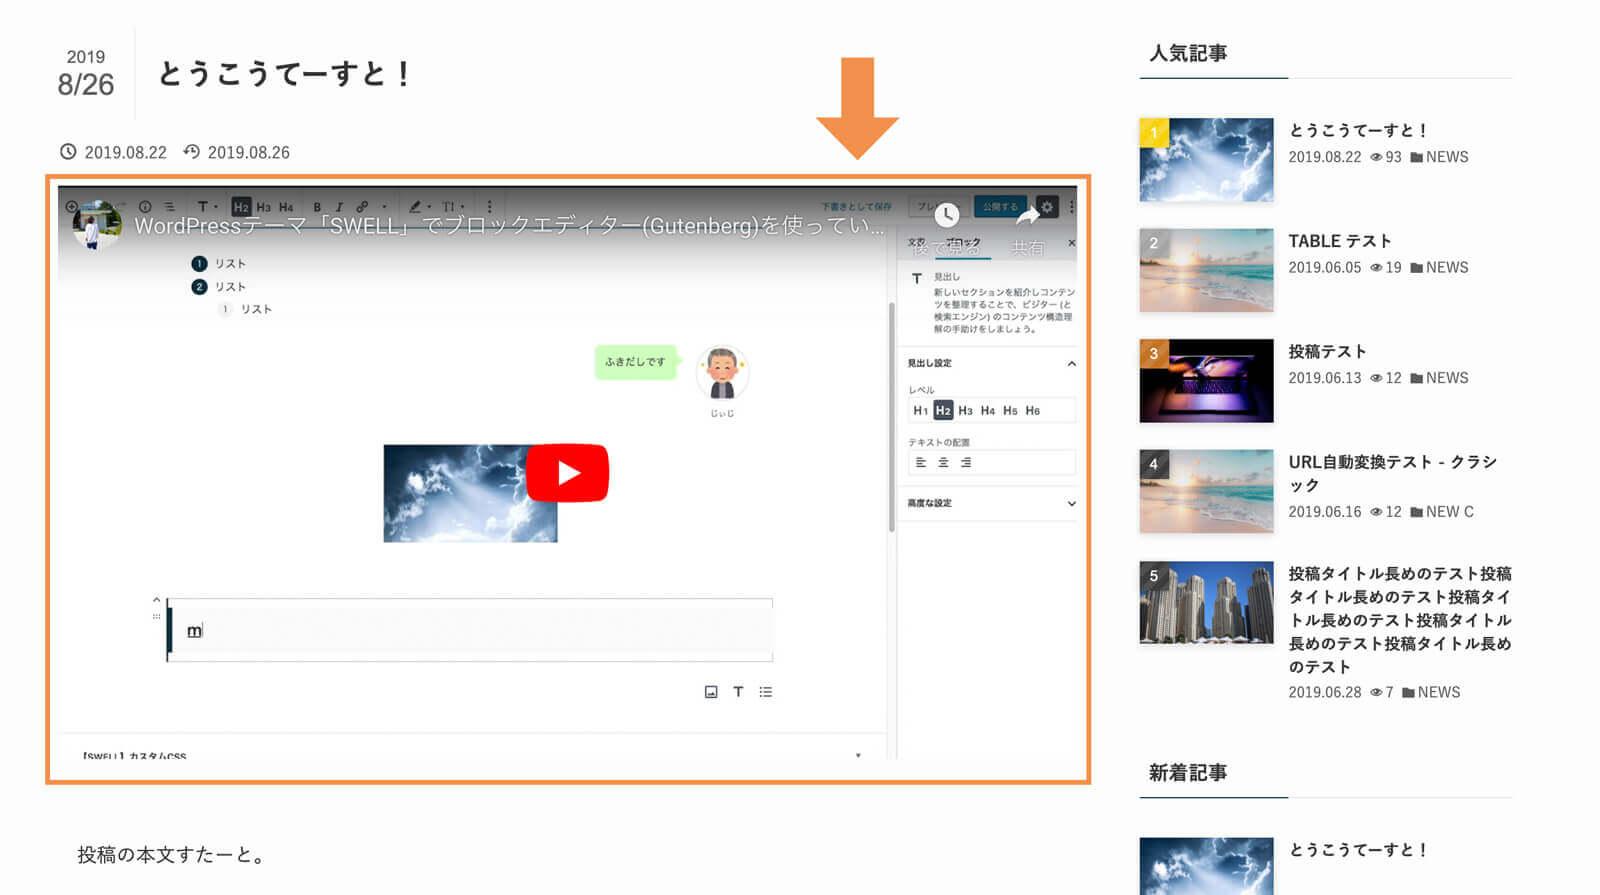 Youtube動画を埋め込んだ場合の表示例